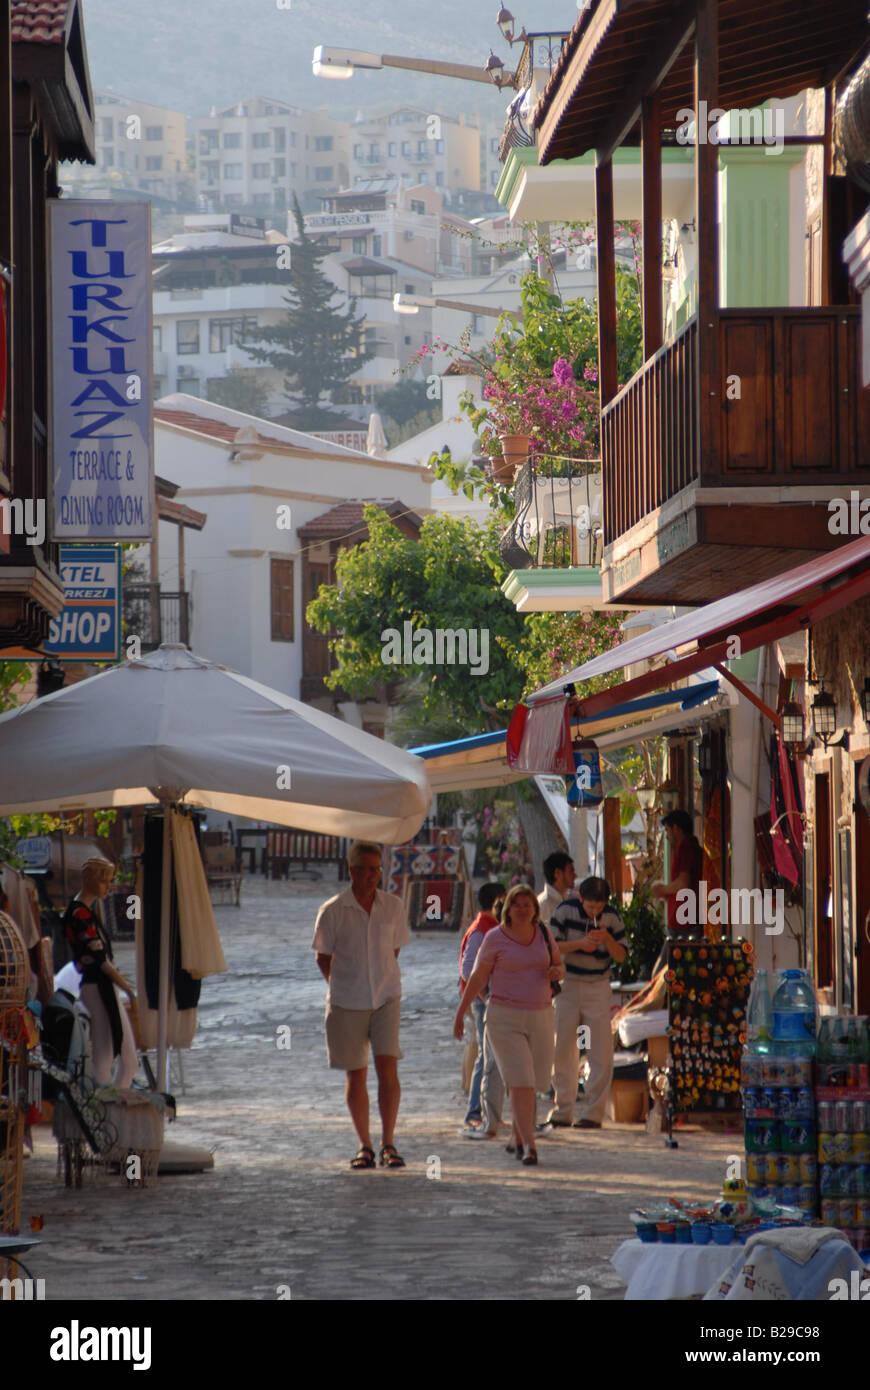 Kalkan Turkey Ref ZB689 112131 0094 COMPULSORY CREDIT World Pictures Photoshot - Stock Image